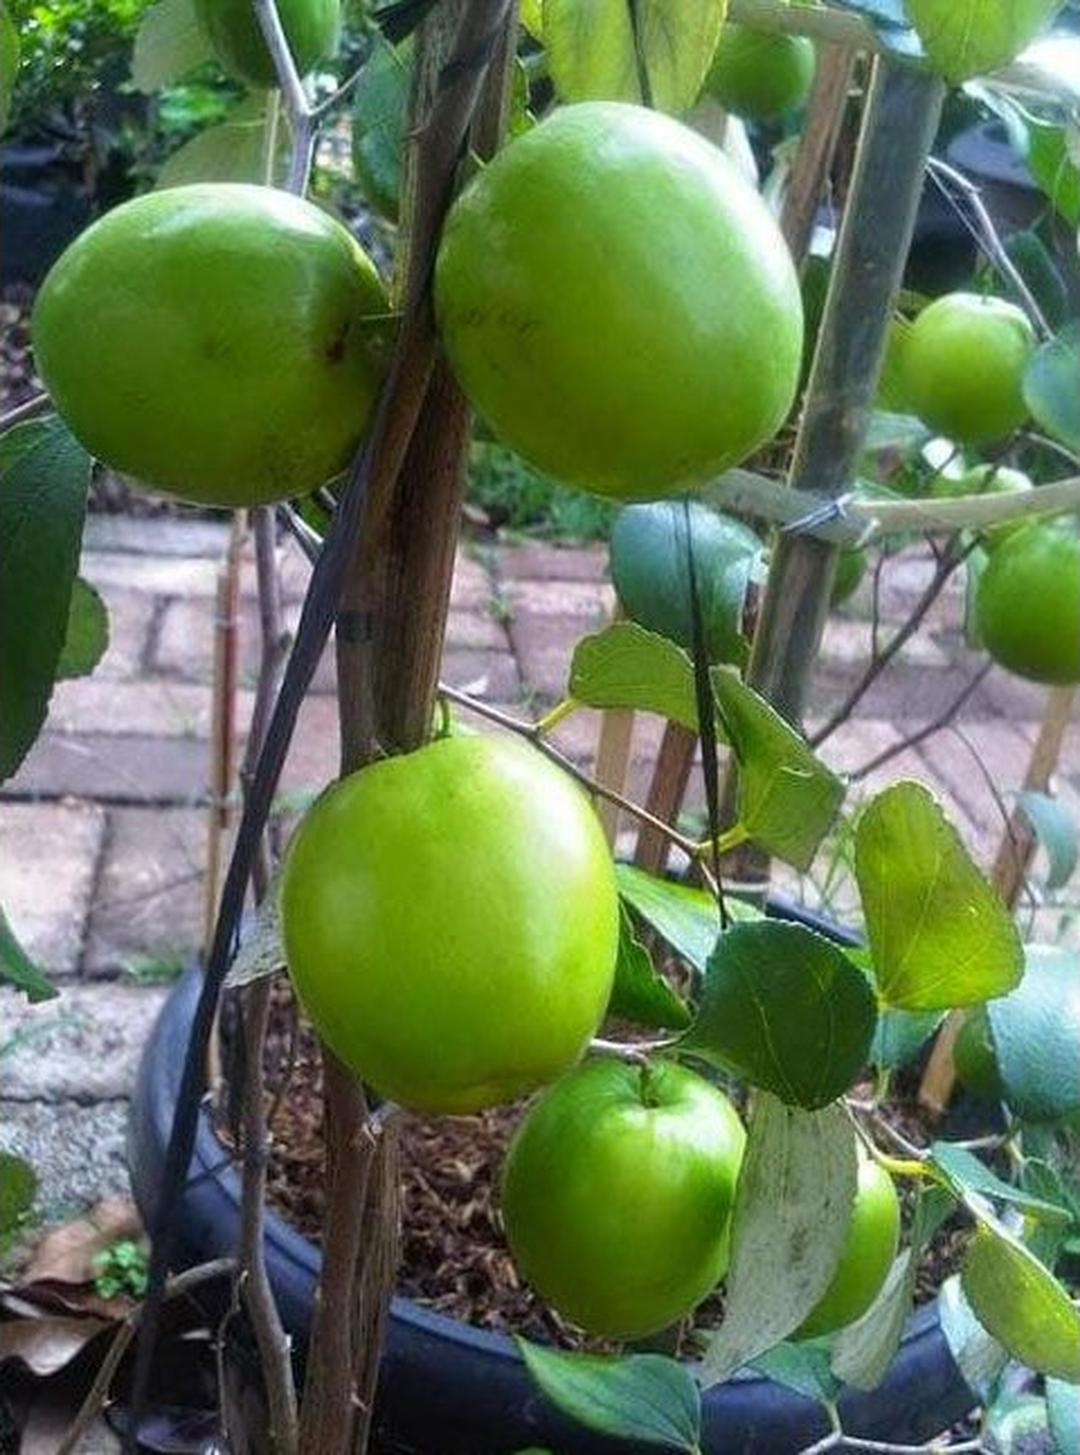 Bisa Borong! Unggul Bibit Tanaman Buah Apel Putsa India A Kota Bogor #bibit buah buahan